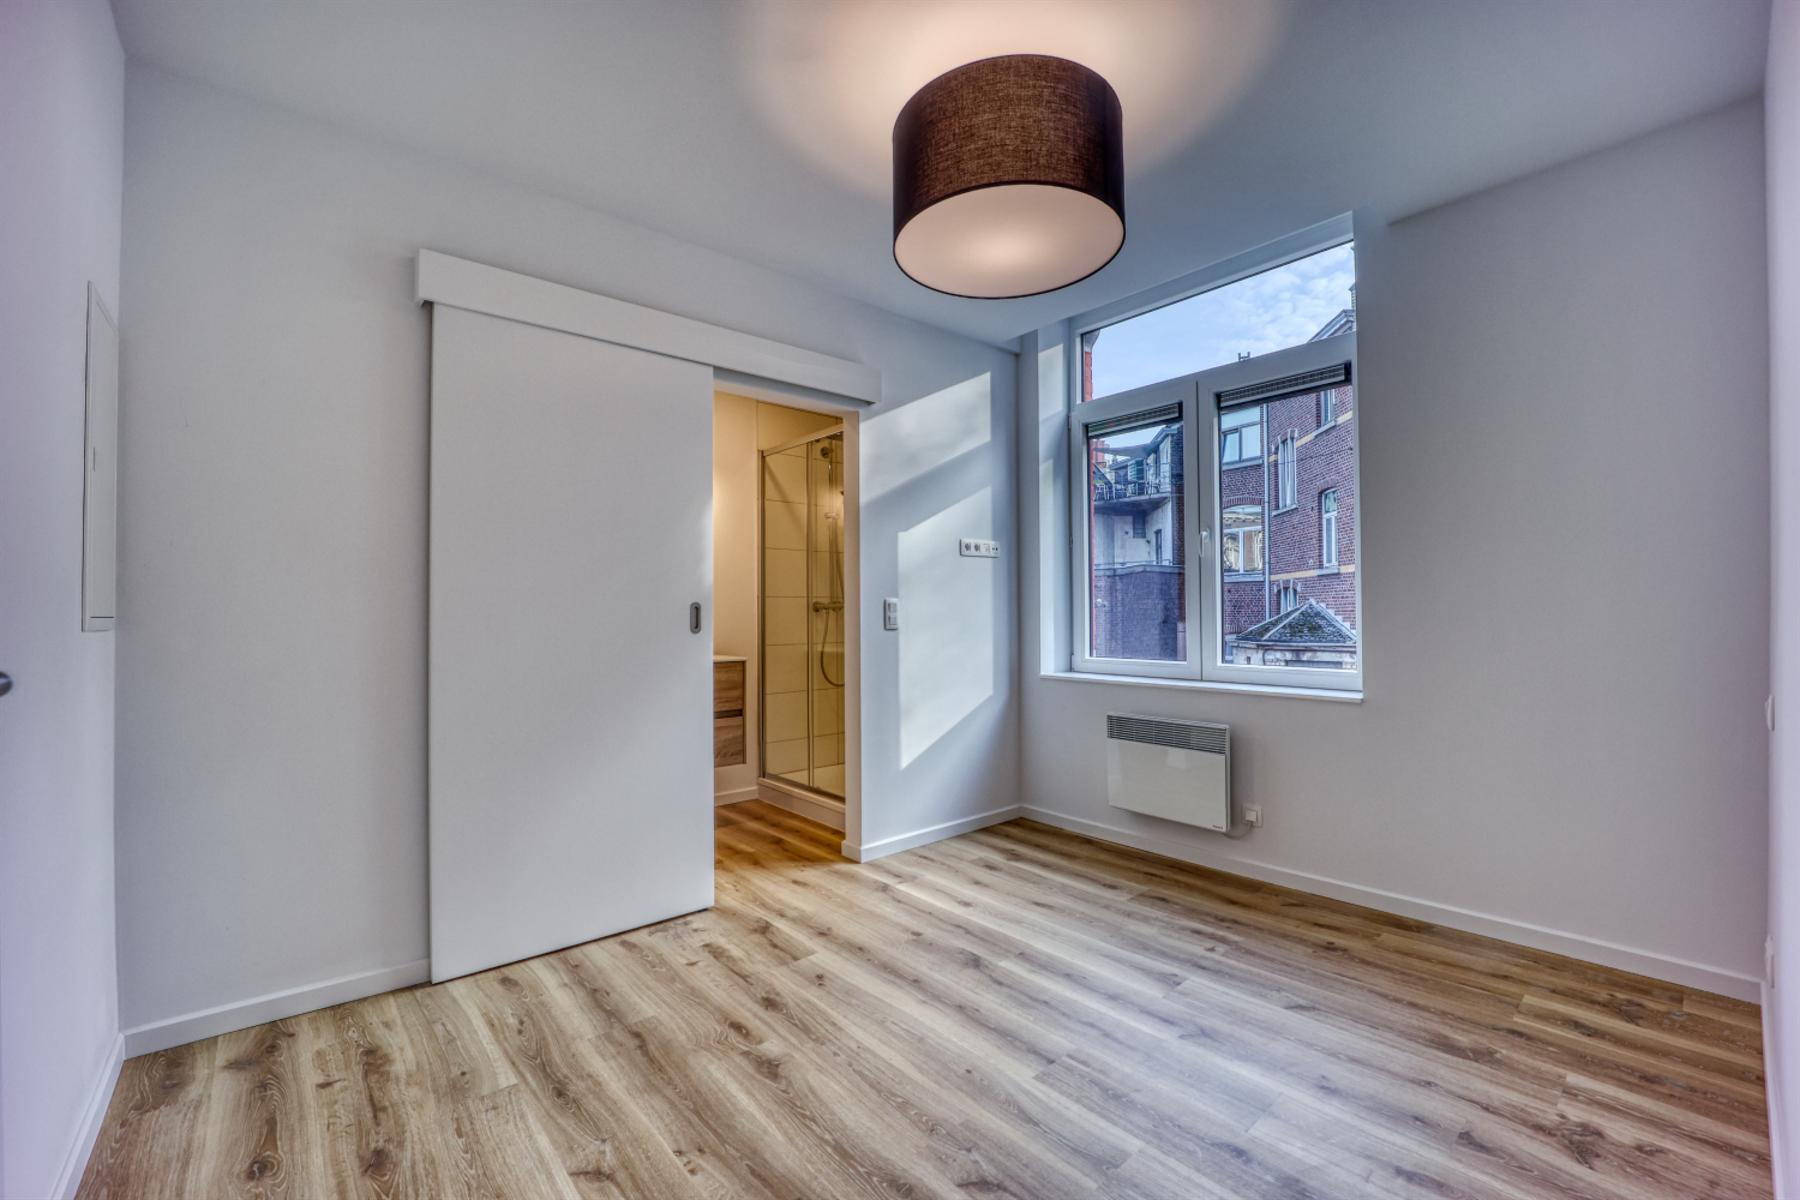 Appartement - Liège - #4512665-16